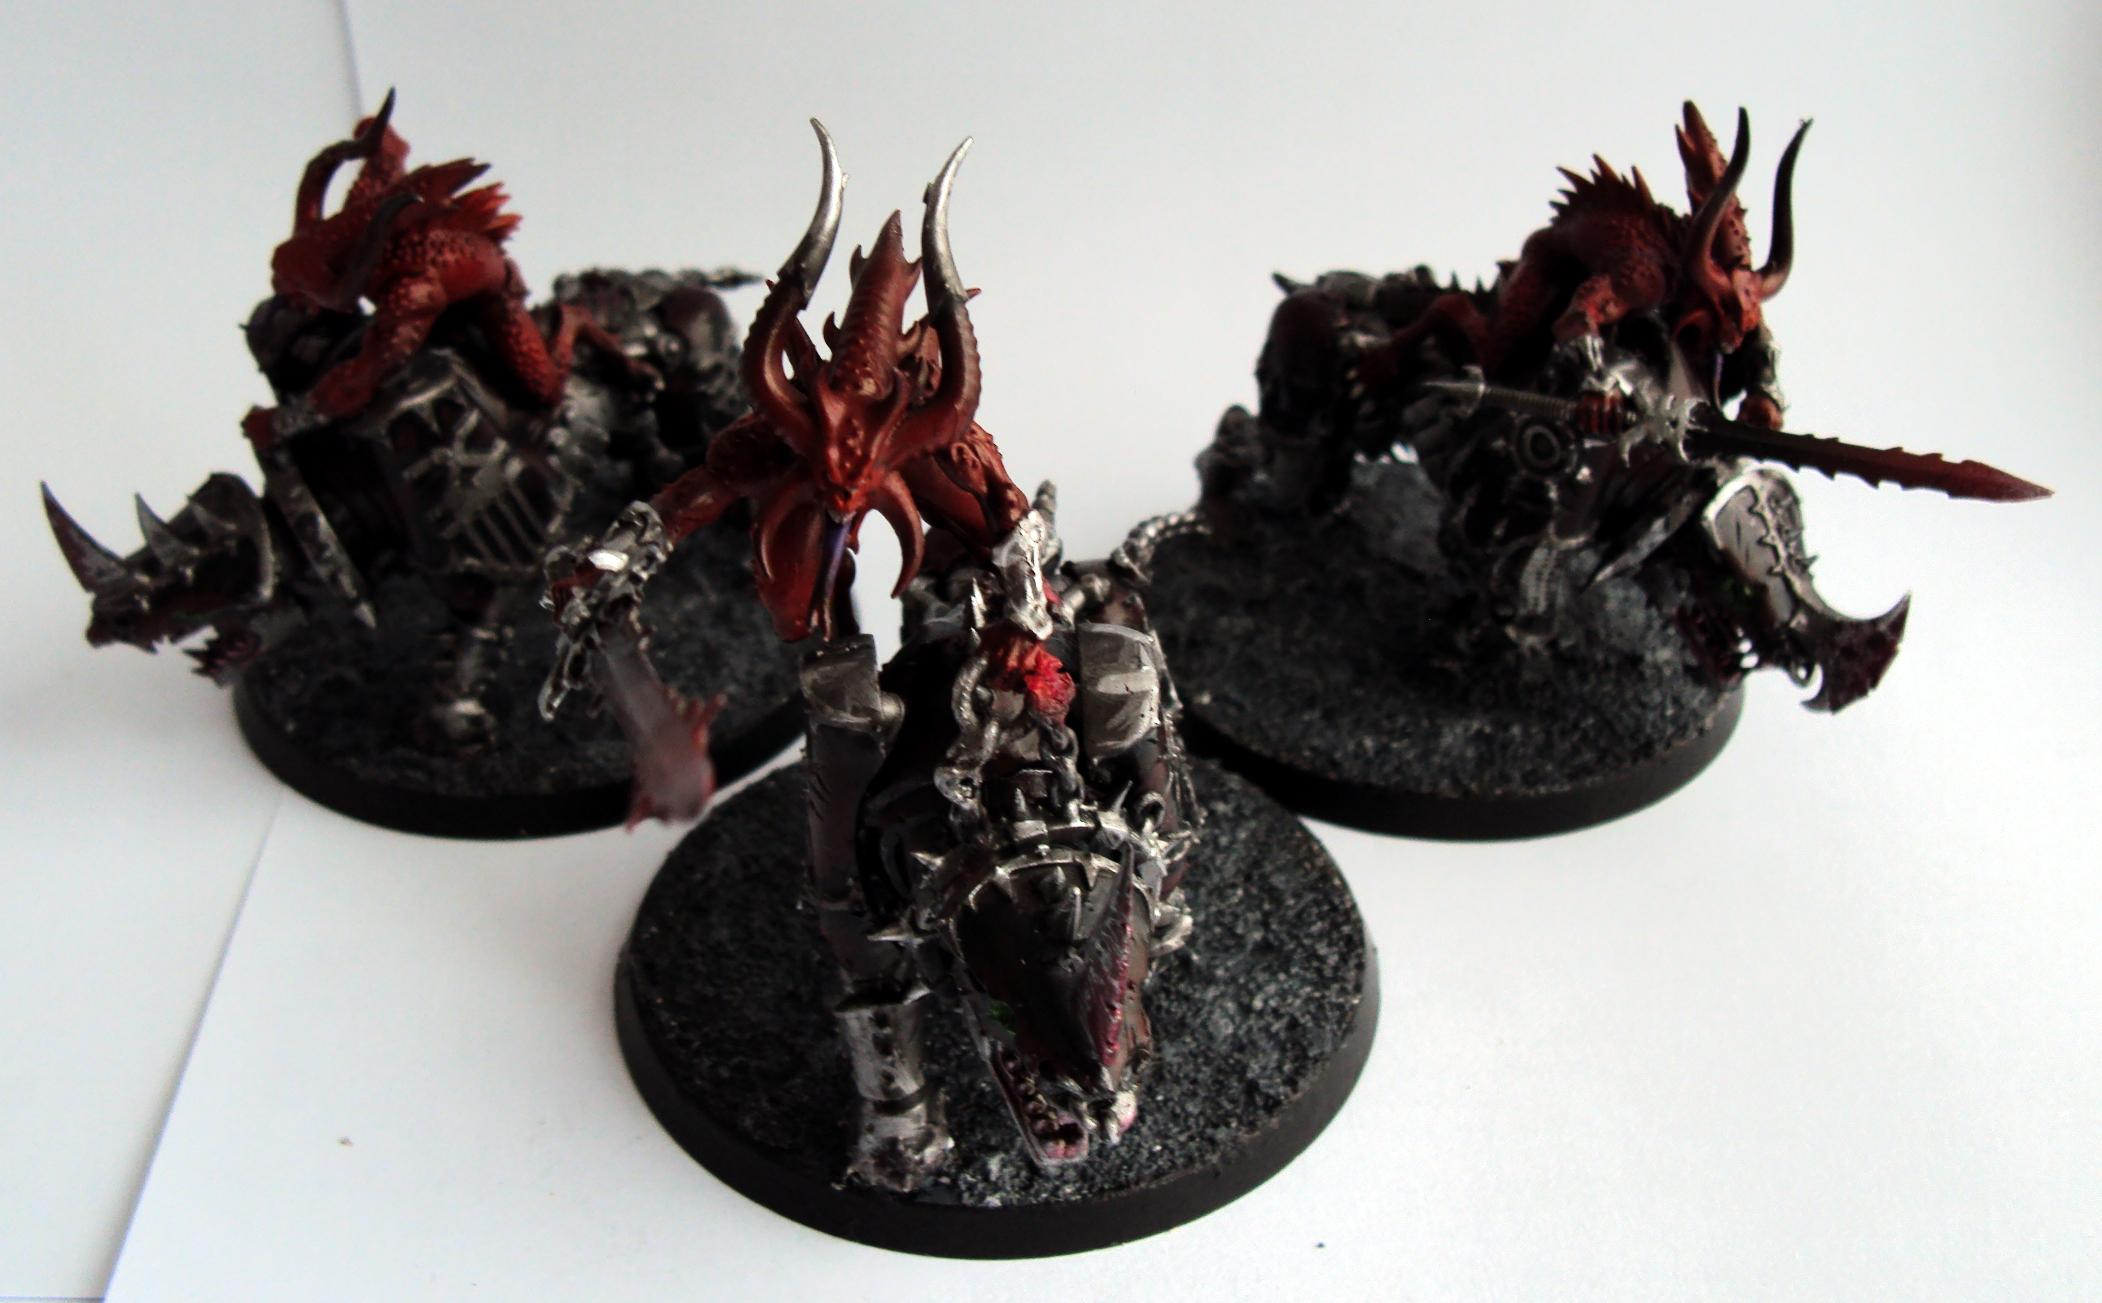 Bloodcrushers, Chaos Daemons, Juggernaut, Khorne, Warhammer 40,000